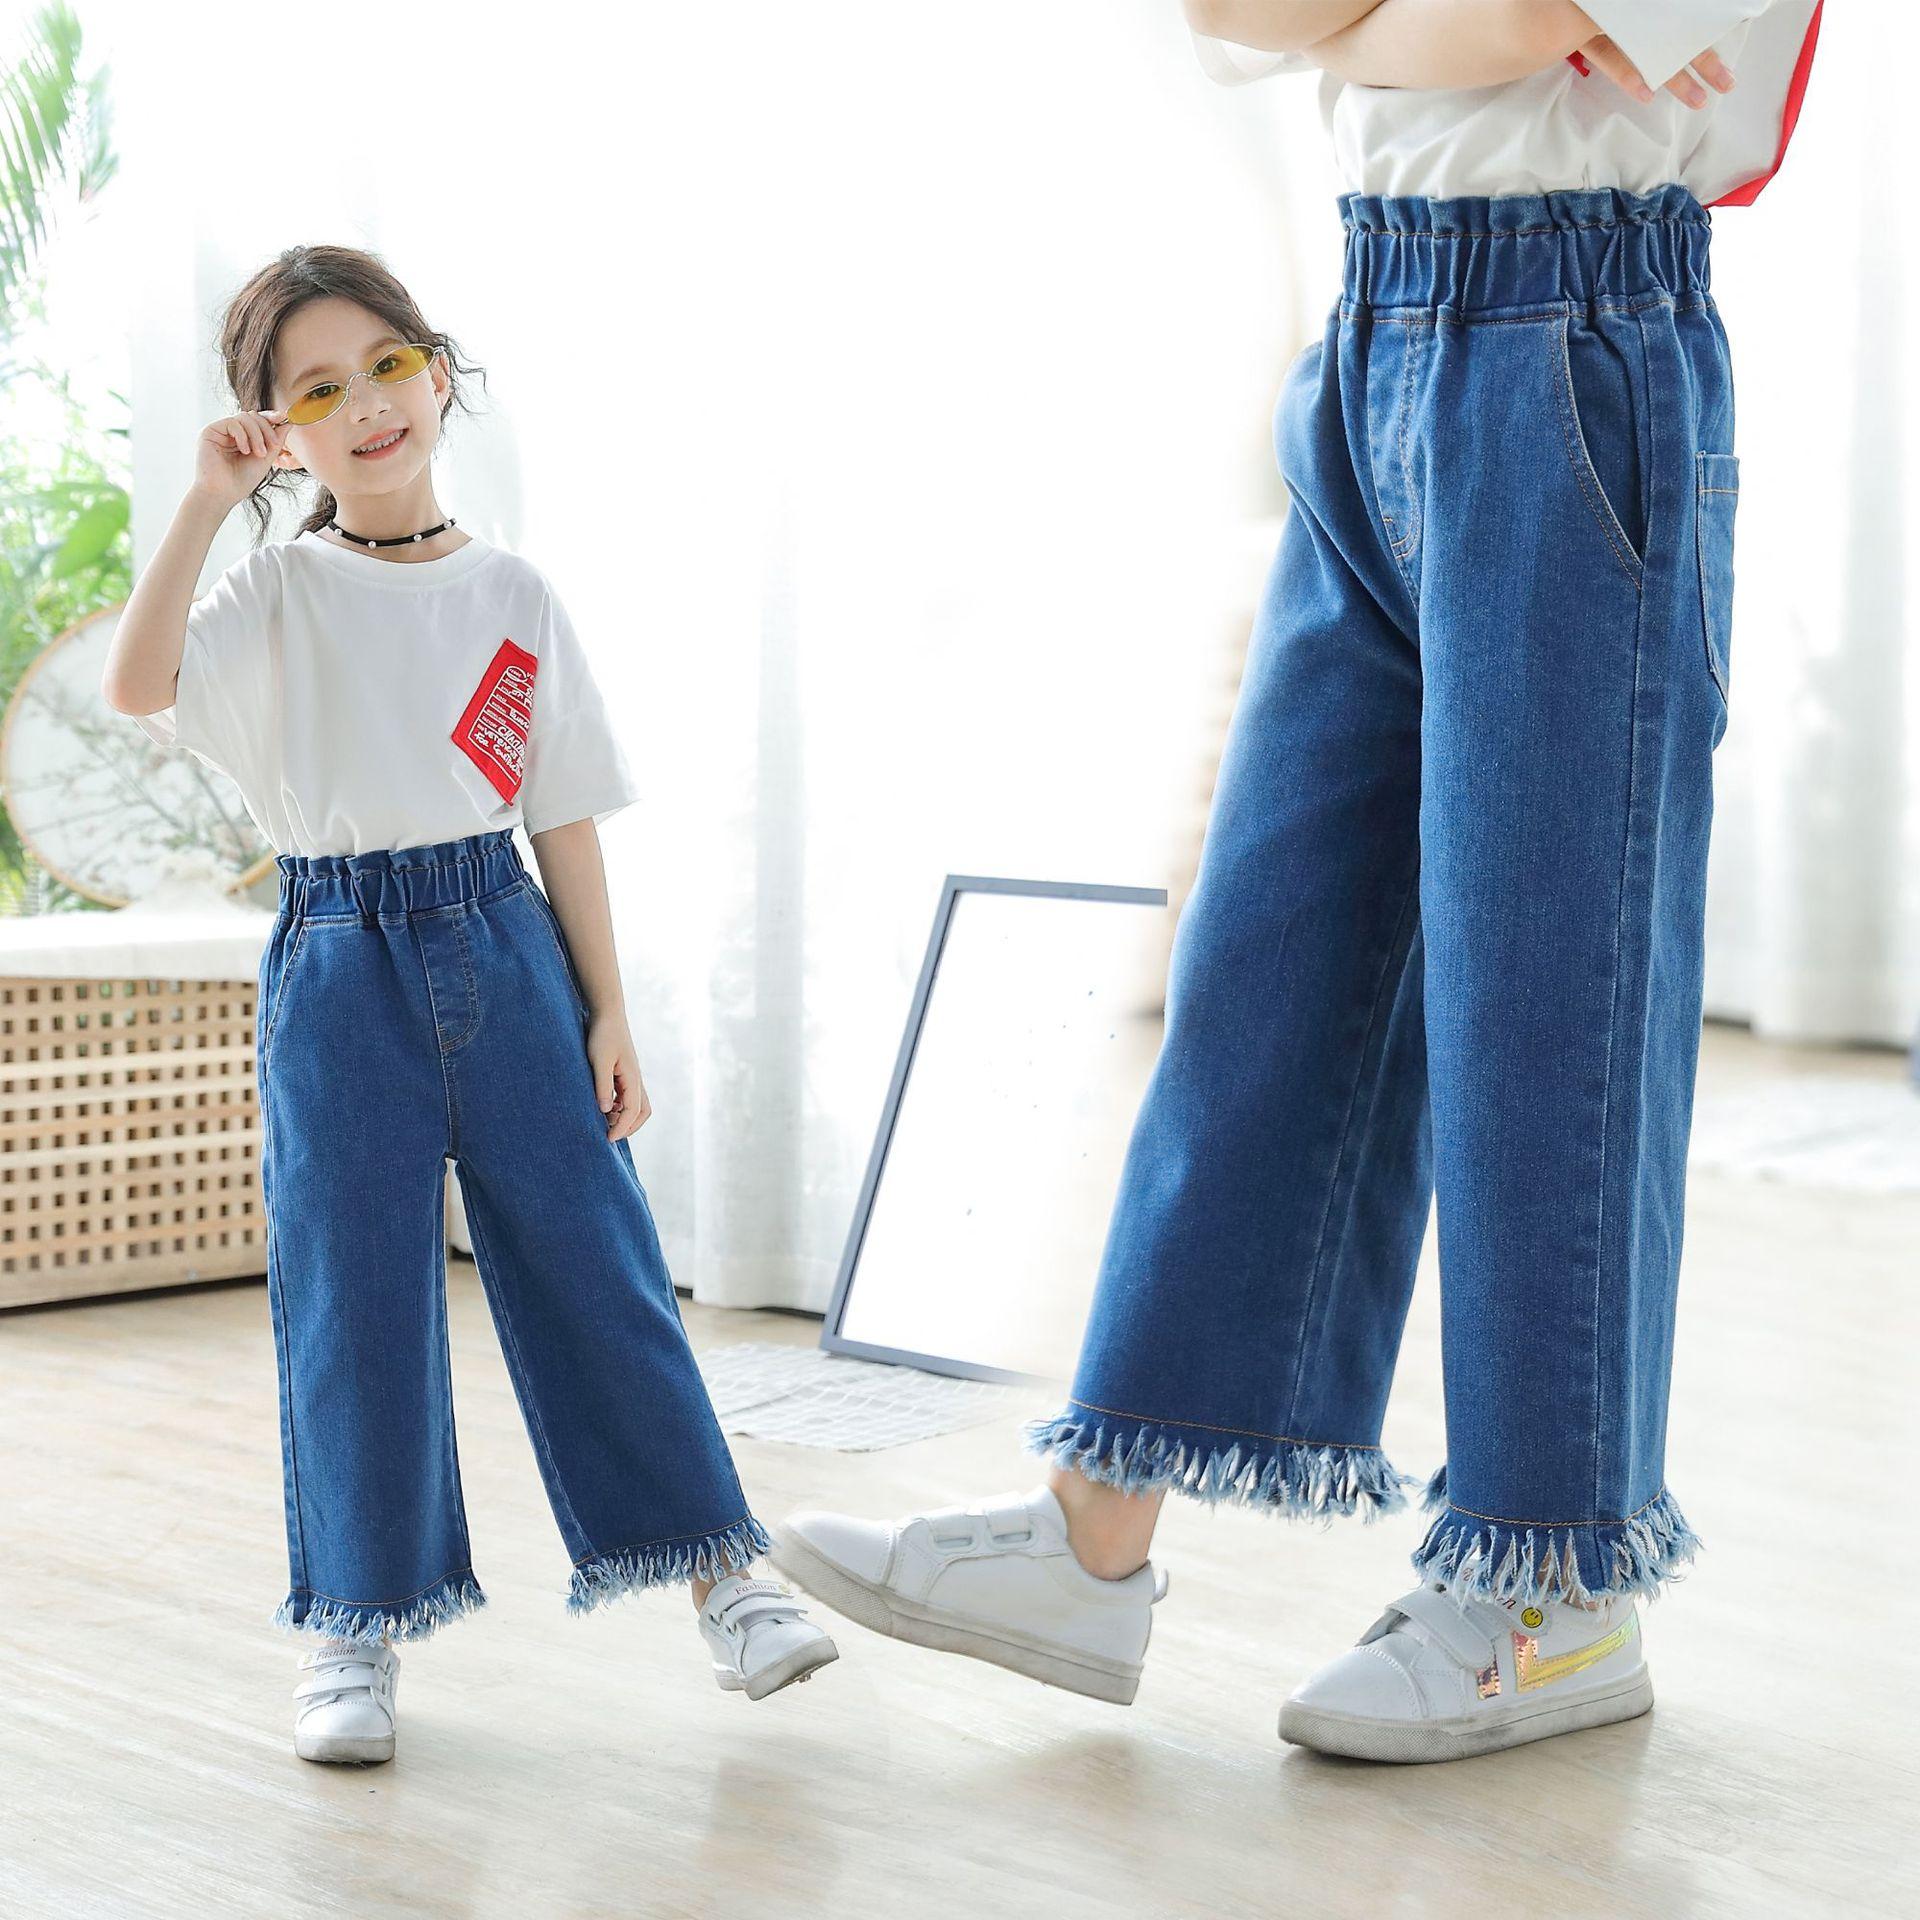 Pantalones Vaqueros Para Ninas Ropa De Vaqueros Para Ninos Comodos Pantalones De Vestir Casuales Pantalones De Pierna Ancha De Moda Pantalones Vaqueros Aliexpress